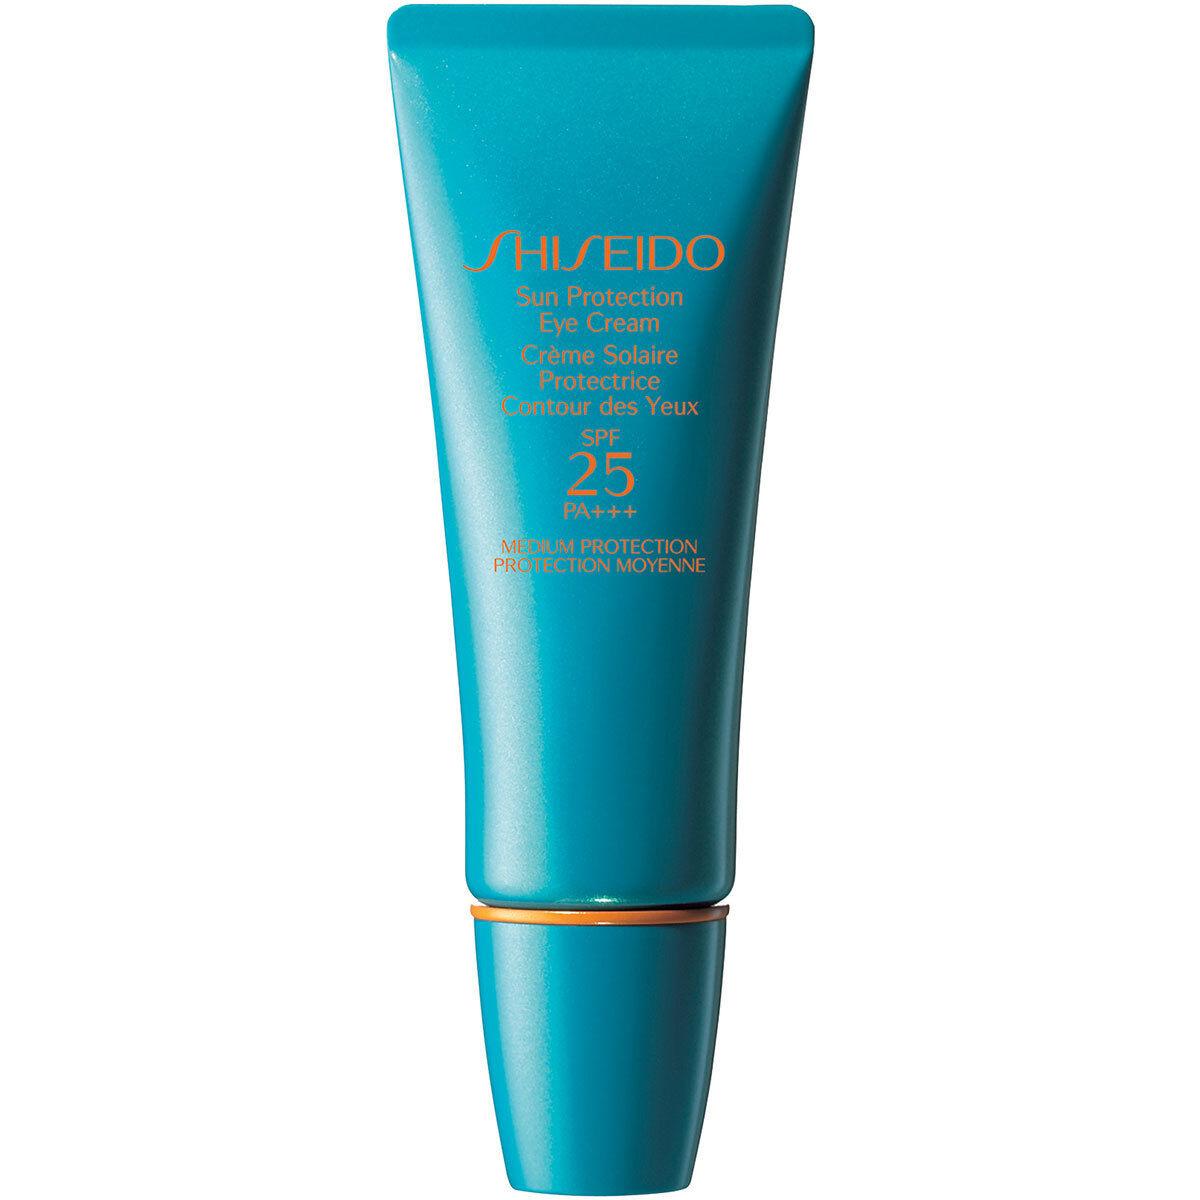 sản phẩm cho vùng mắt Shiseido Sun Protection Eye Cream Broad Spectrum SPF 34 Suncreen